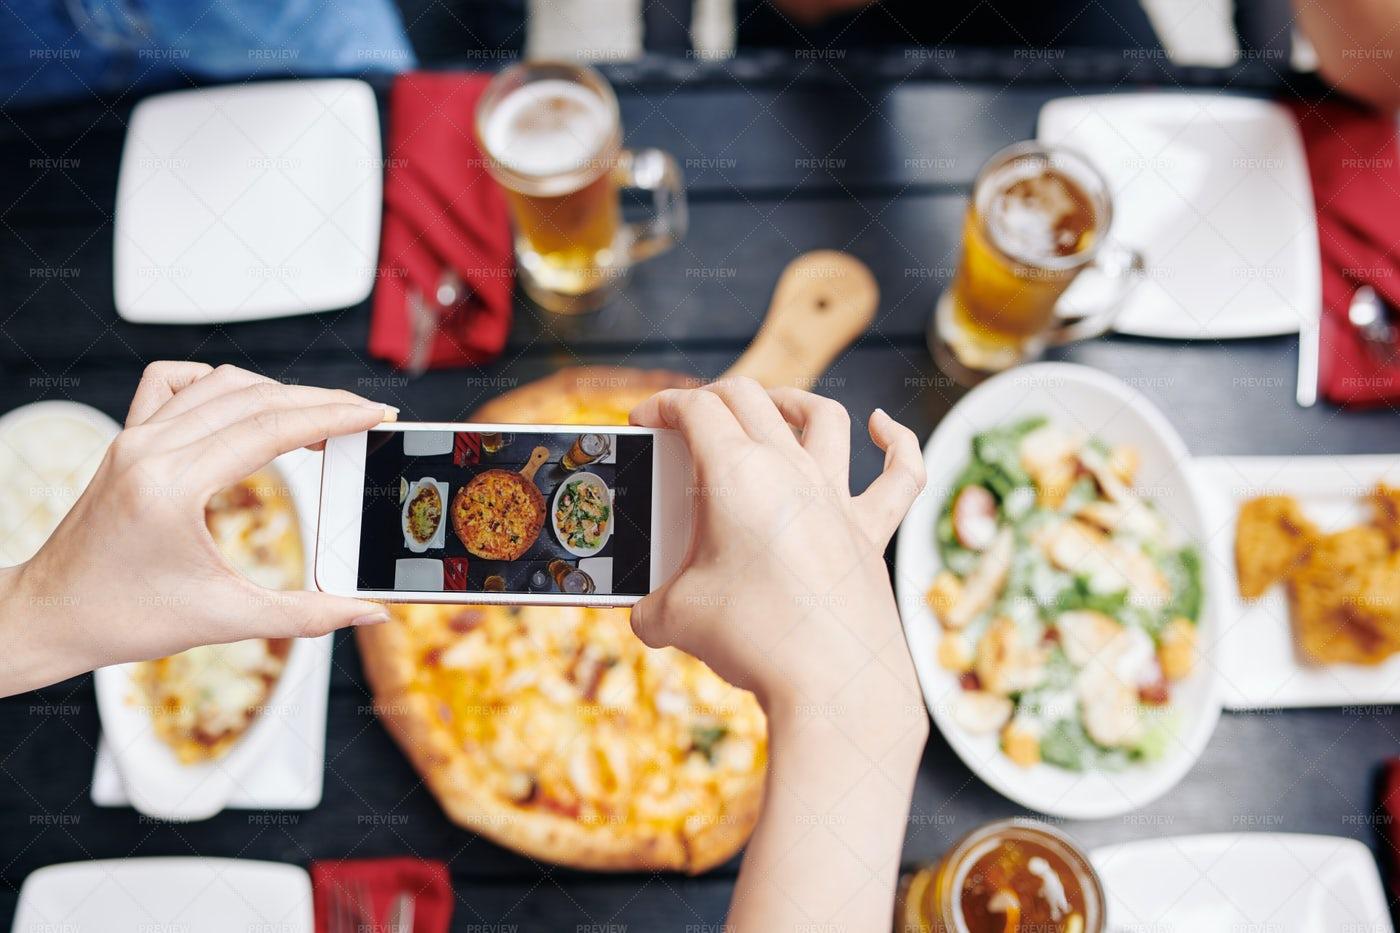 Photo Of Delicious Dinner: Stock Photos